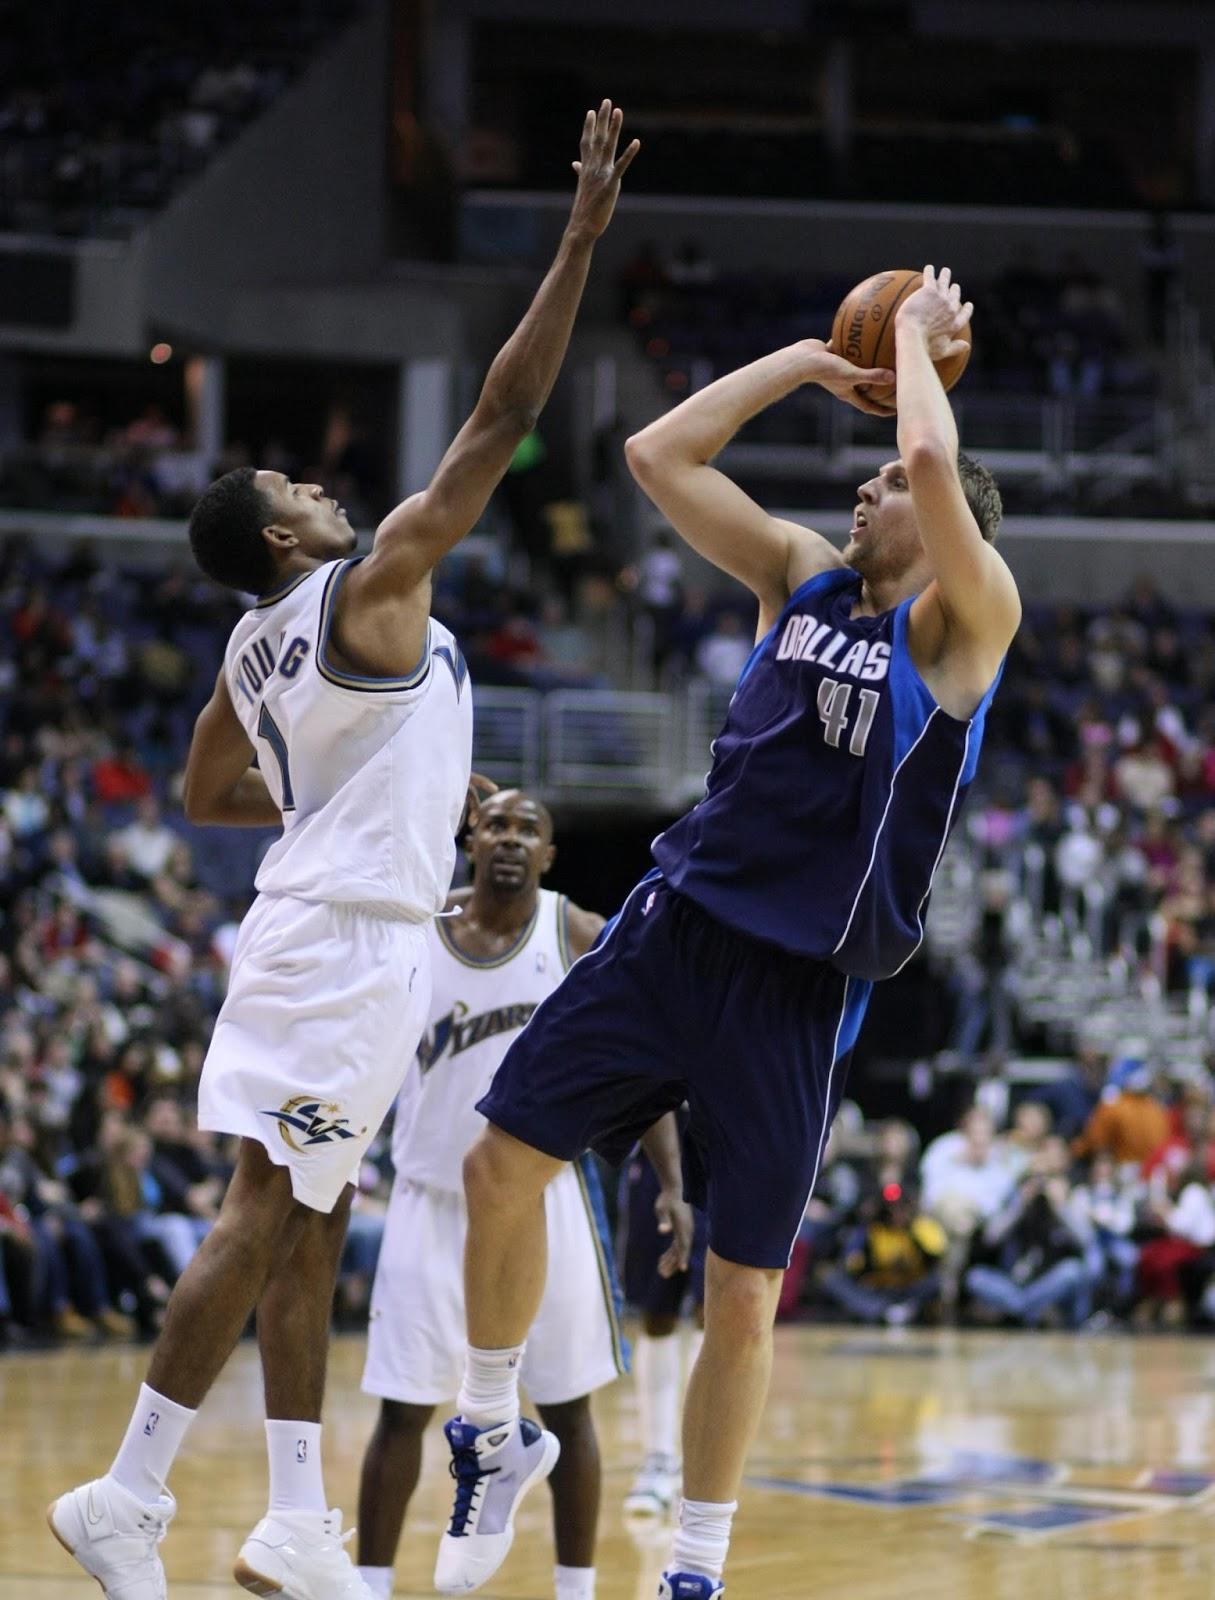 Gambar Tehnik Dasar Bola Voli Icefilmsinfo Globolister Teknik Permainan Bola Basket Profesional Lengkap Beserta Gambar